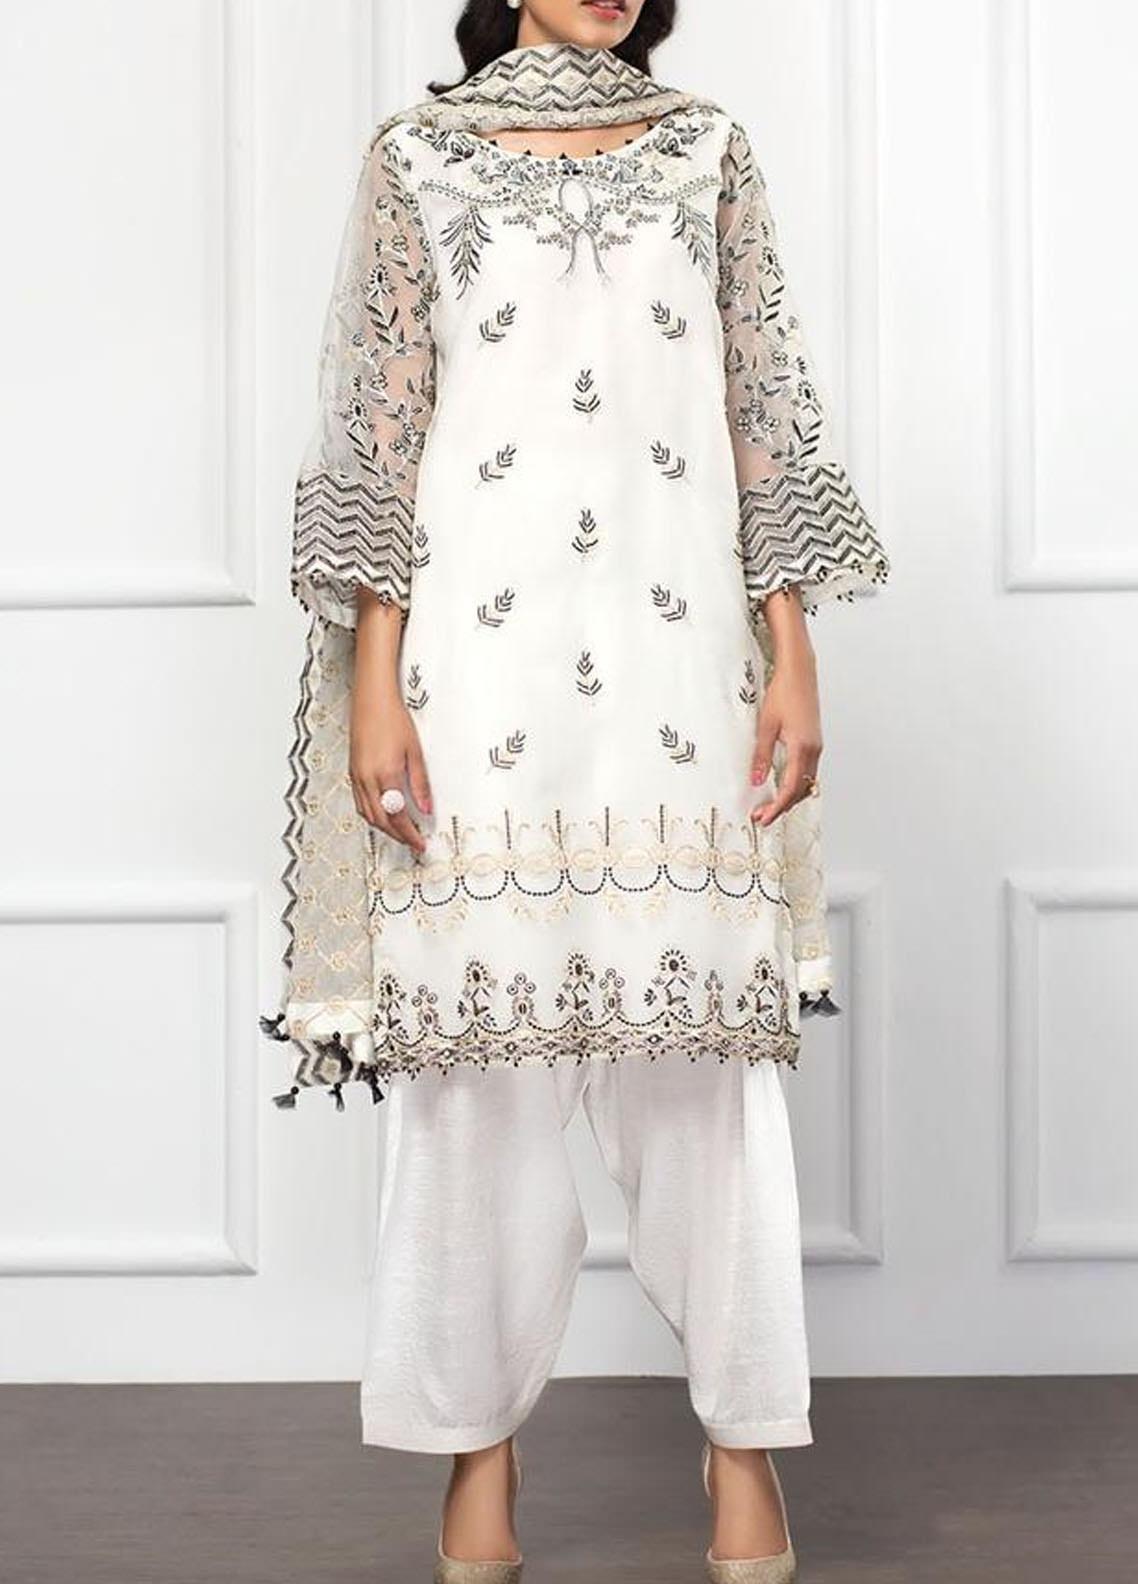 XENIA Formals Embroidered Organza Stitched 3 Piece Suit XFR-20-142 WONDER DREAM